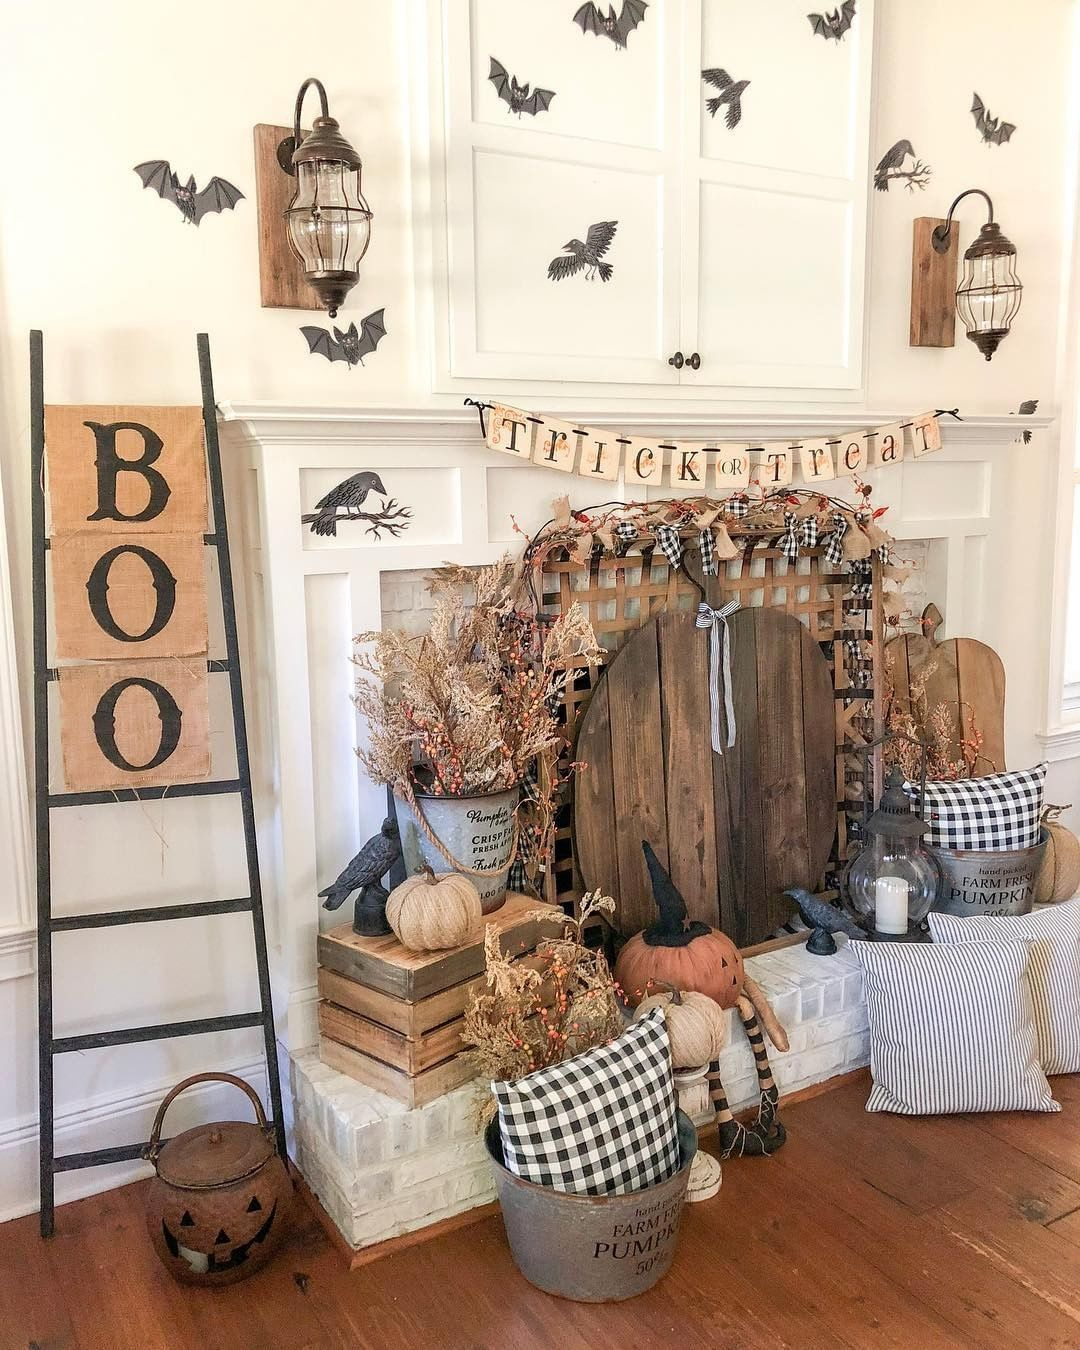 Decorsteals Com On Instagram Just A Little Spooky Decor To Brighten Your Monday Guys Bigfamilylittlefarmho Farmhouse Decor Trends Home Decor Decor